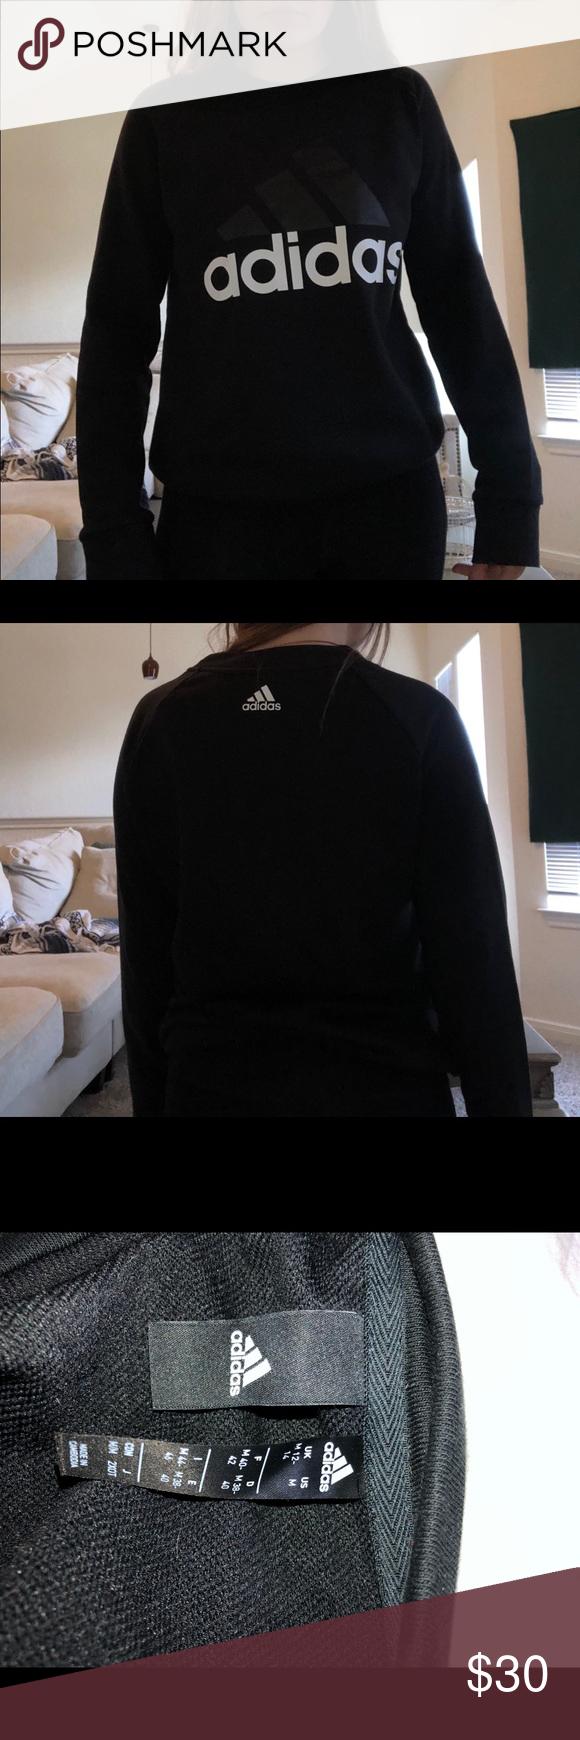 Adidas Women's Sweatshirt size medium Adidas women